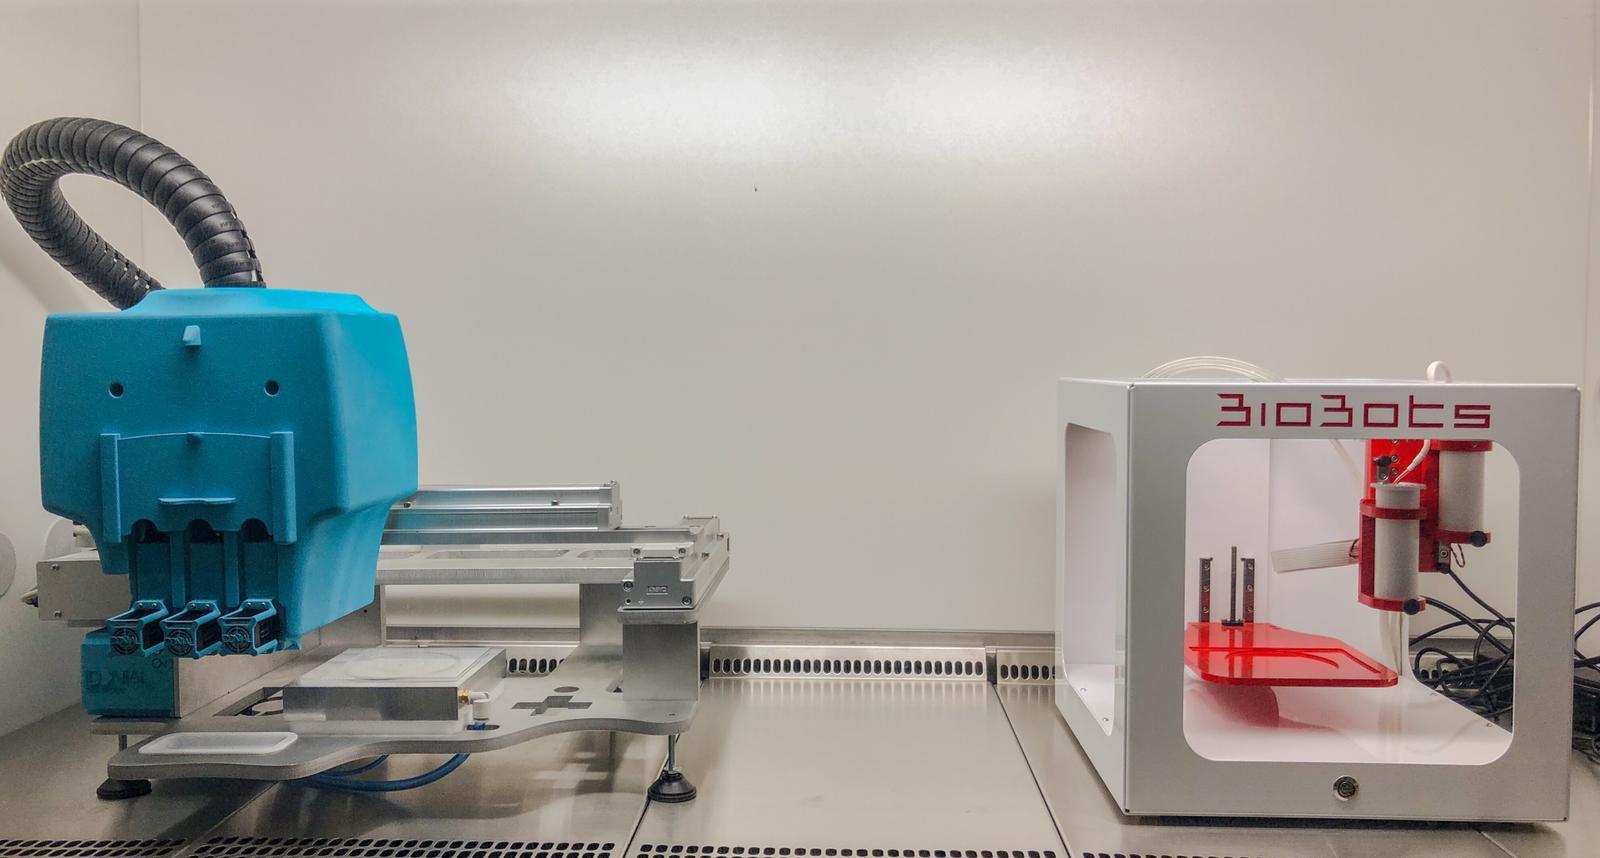 Impresora FDM (F370, Stratasys) y  Biompresora FDM Biobots-Allevi